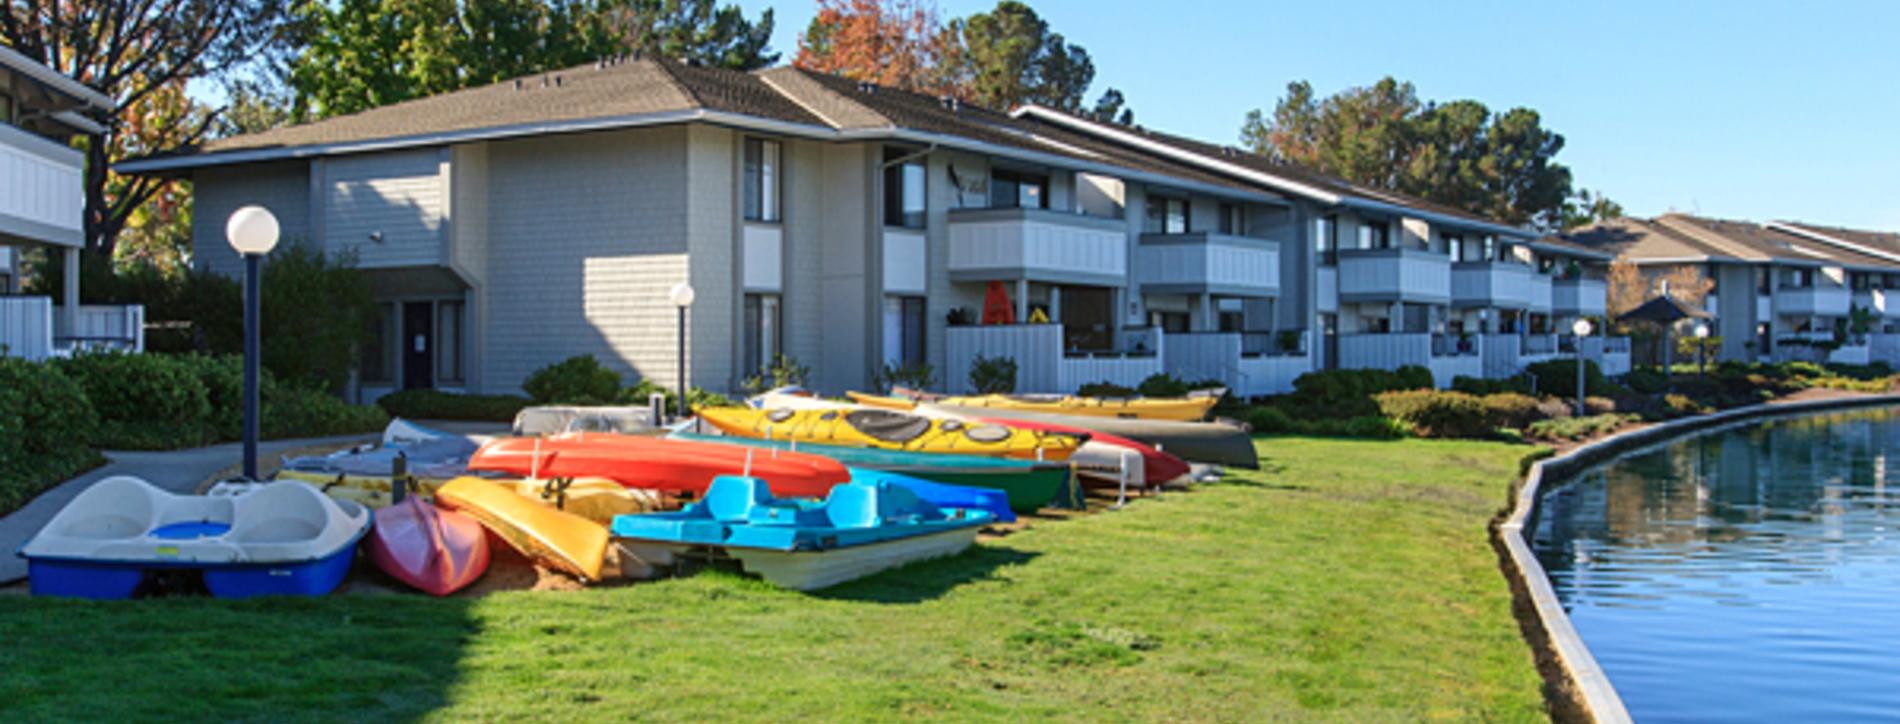 Beach Cove Apartments in Foster City CA